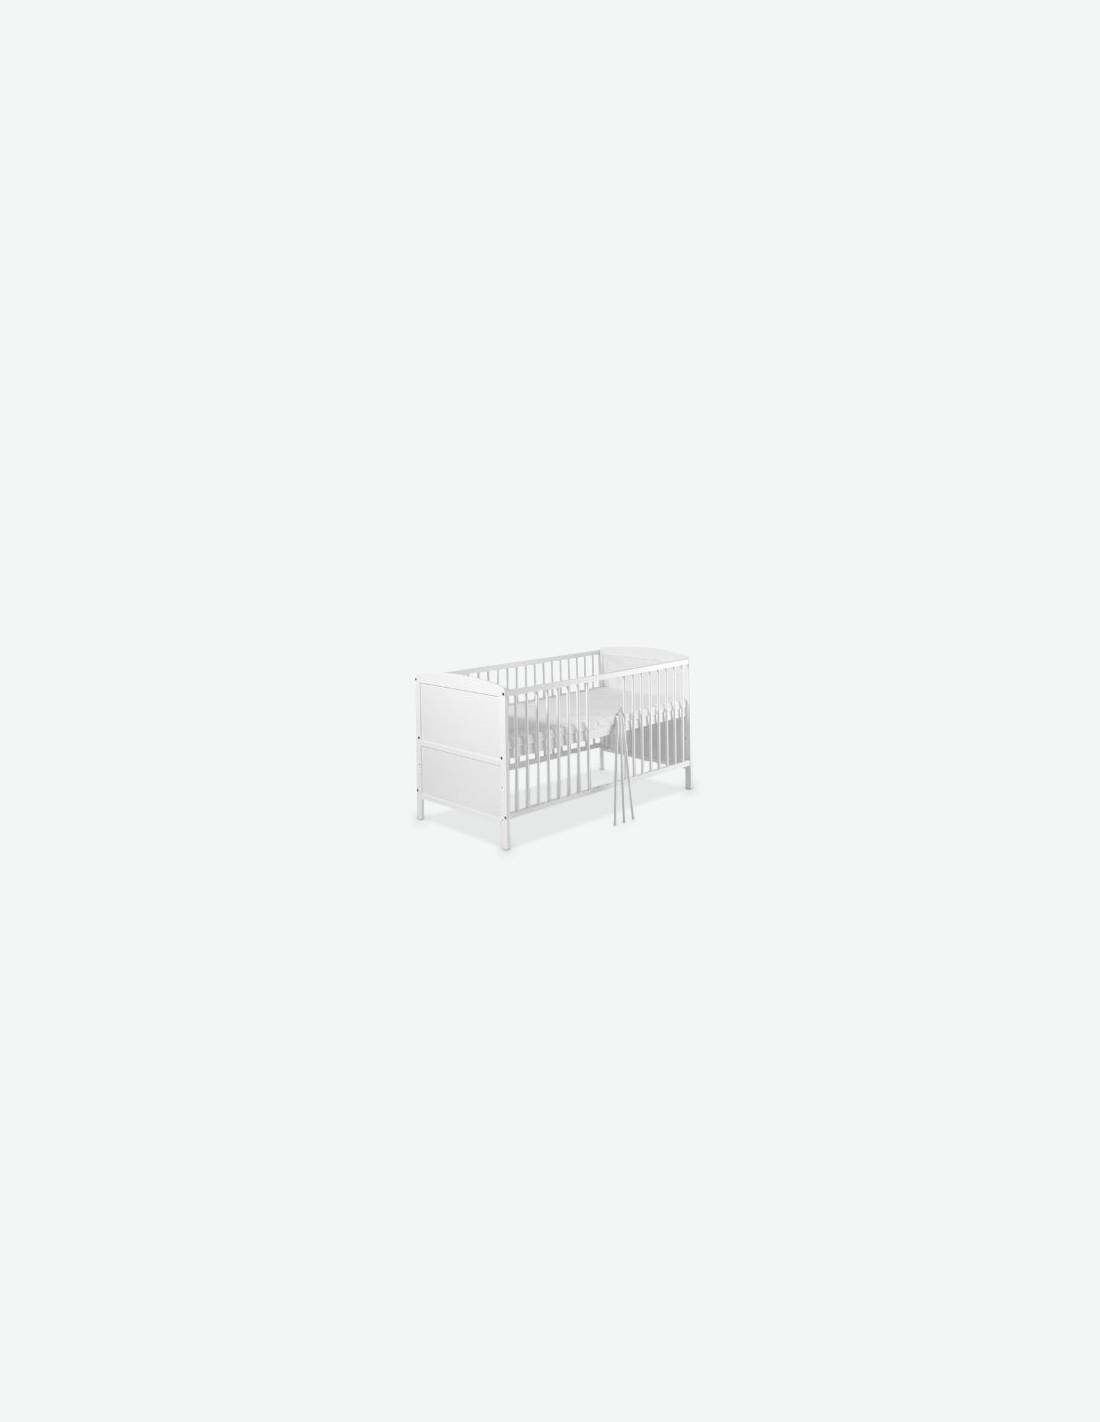 komplettbett wei inkl bett set matratze und himmelstange. Black Bedroom Furniture Sets. Home Design Ideas